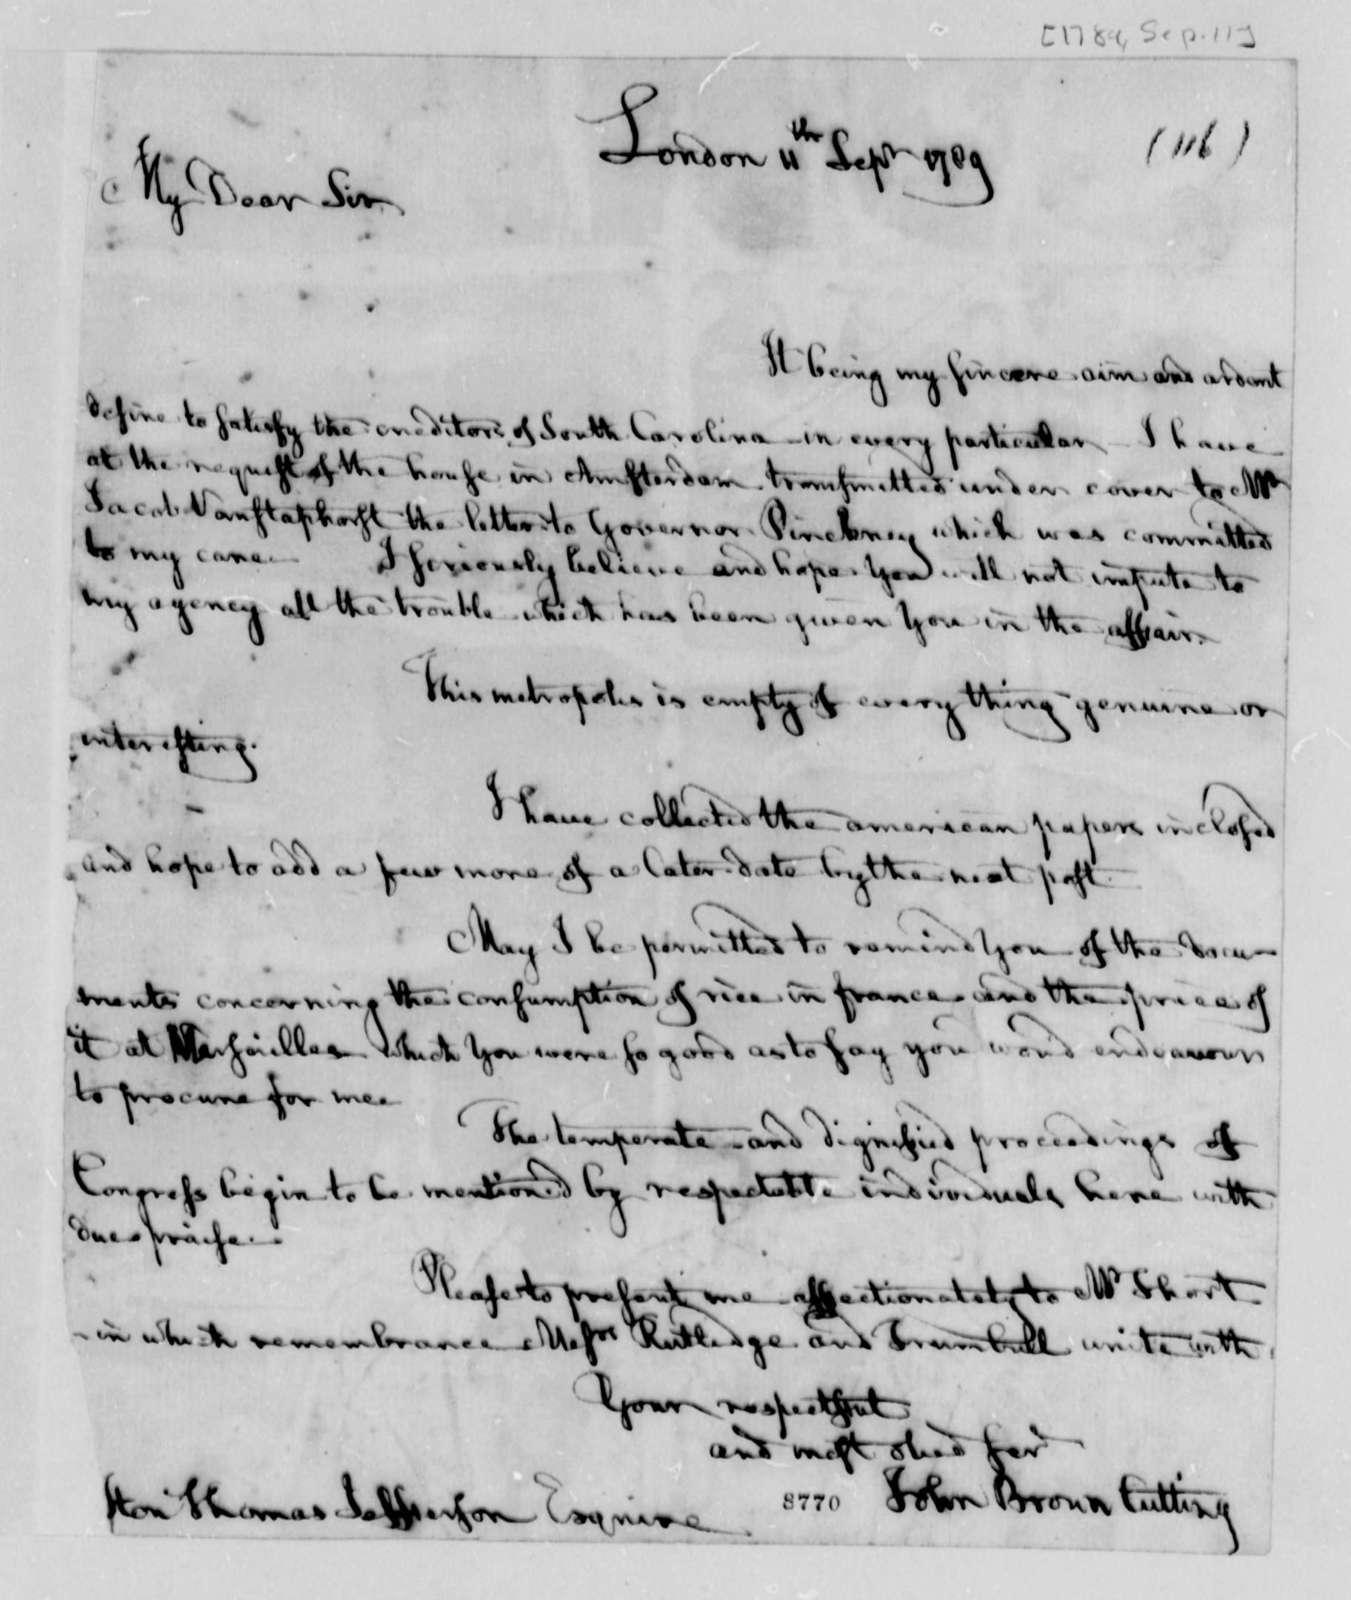 John B. Cutting to Thomas Jefferson, September 11, 1789